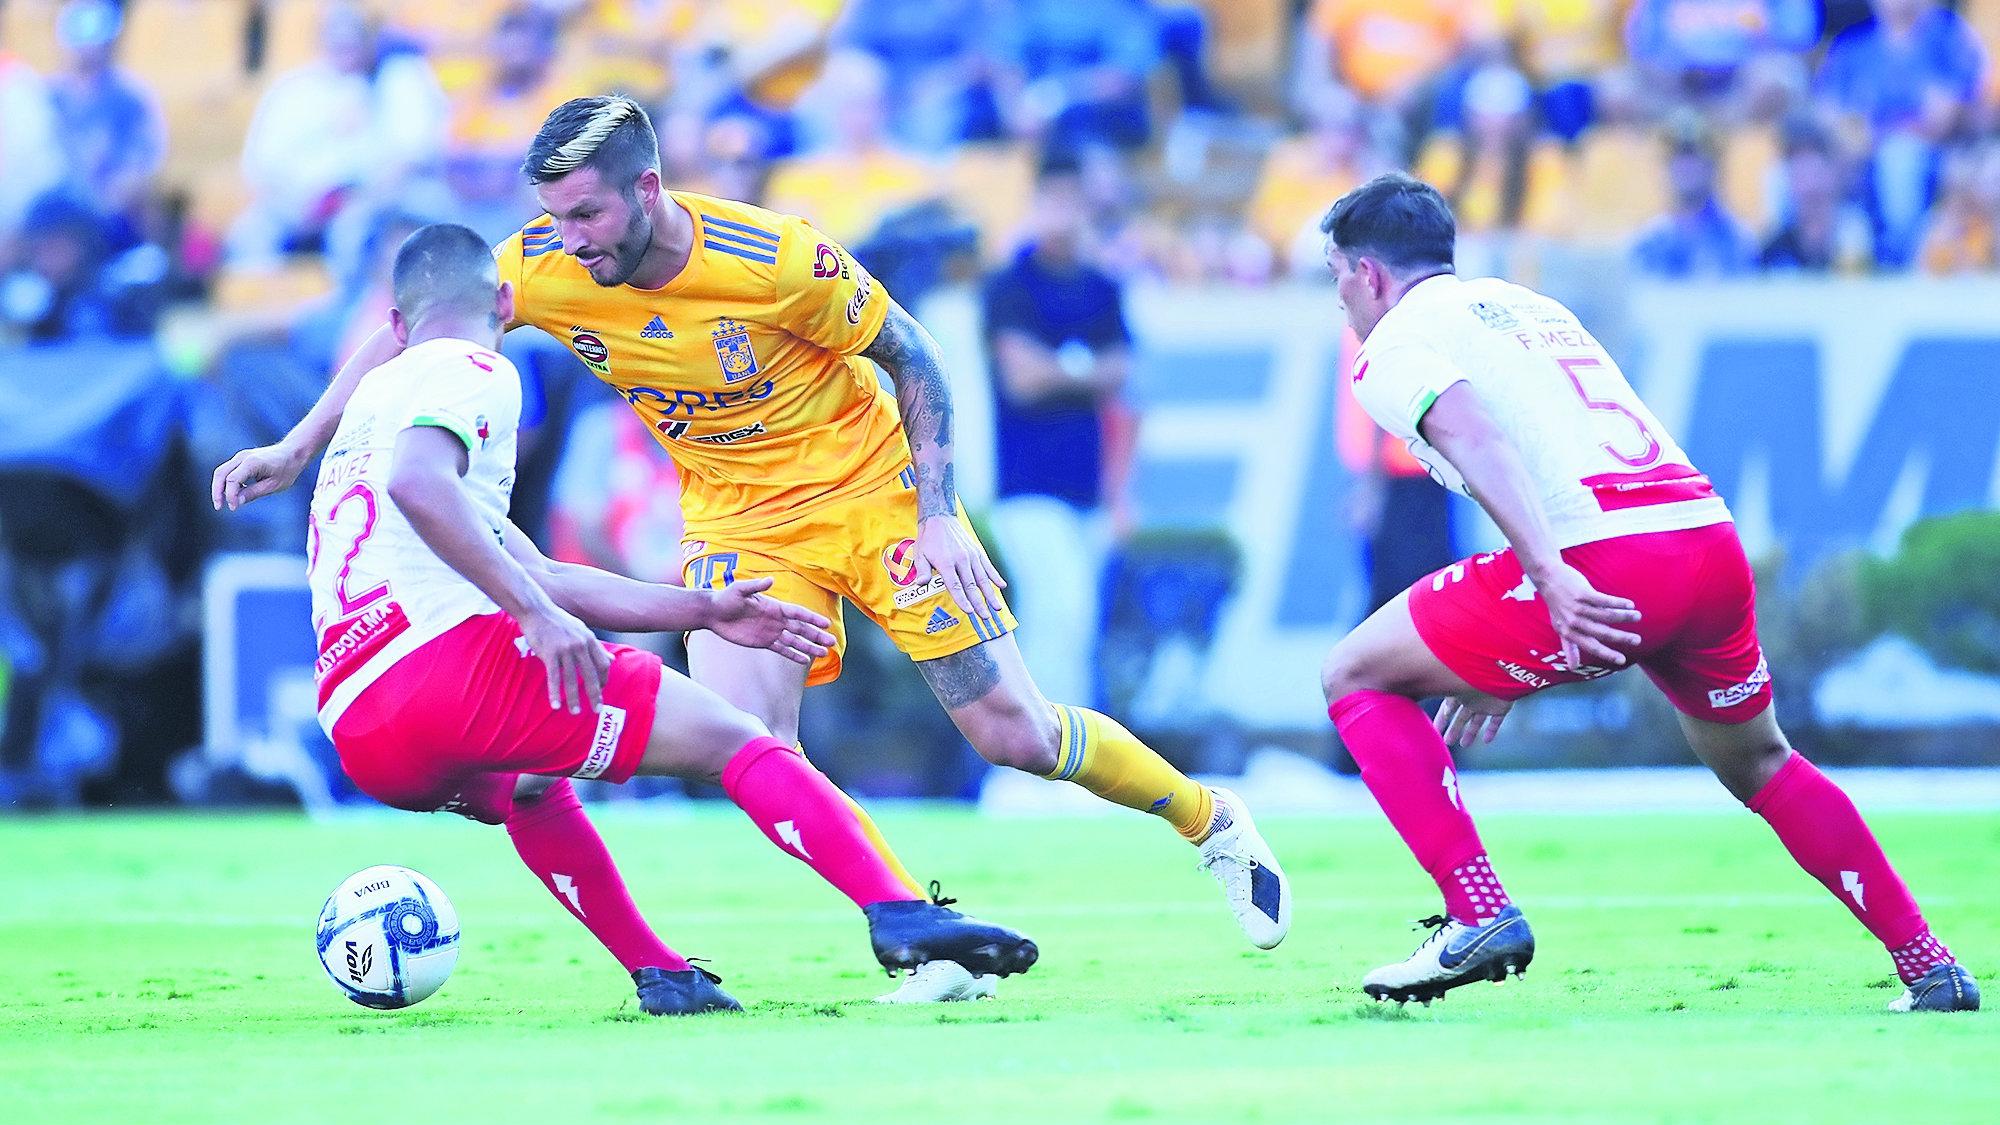 andre pierre gignac tigres necaxa partido 108 goles historia futbol mexicano hat-trick